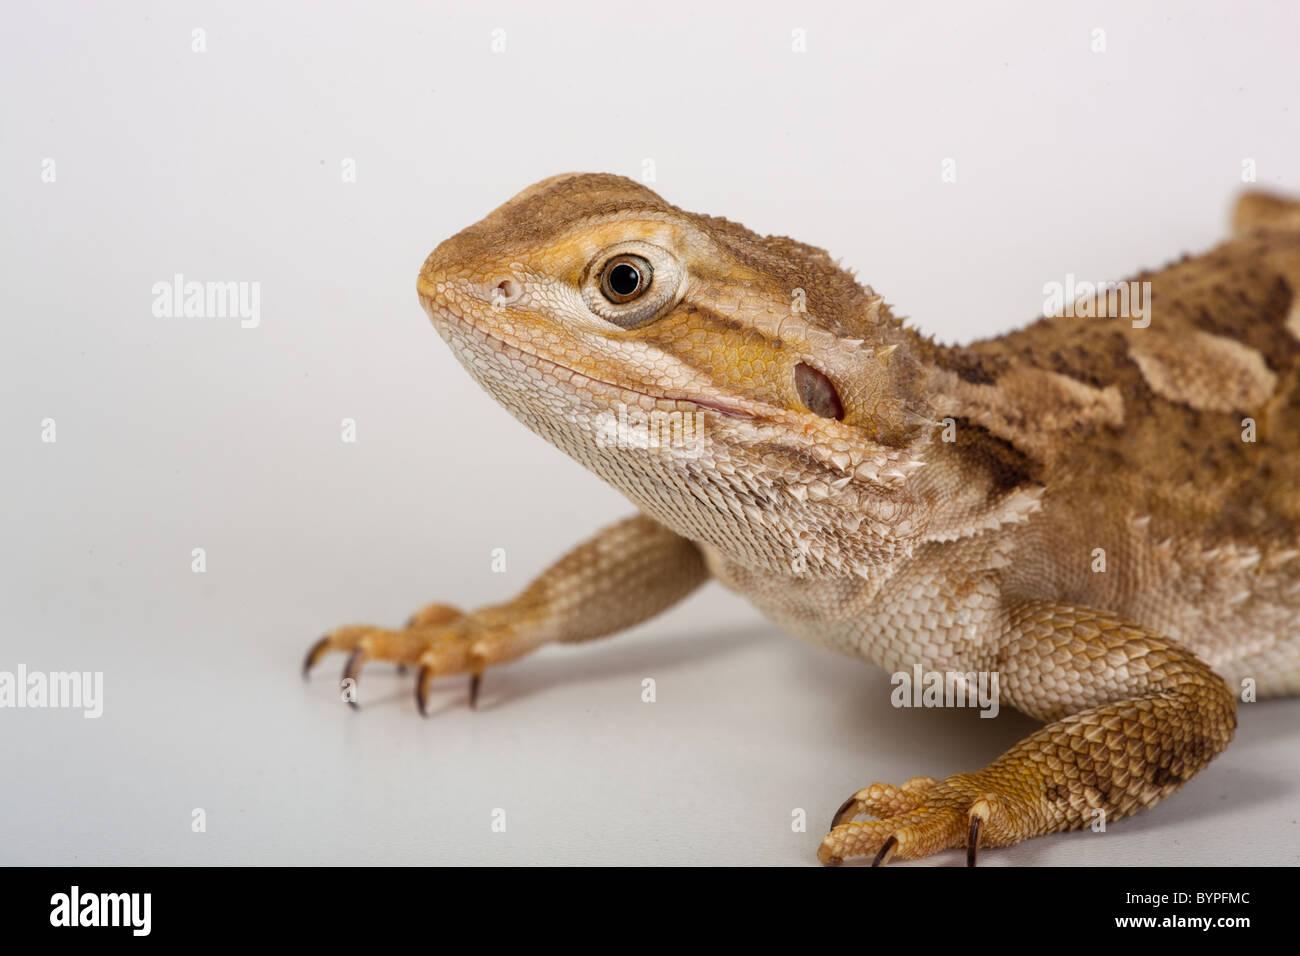 Rankins Dragon Pogona henrylawsoni or Lawsons Dragon - Stock Image